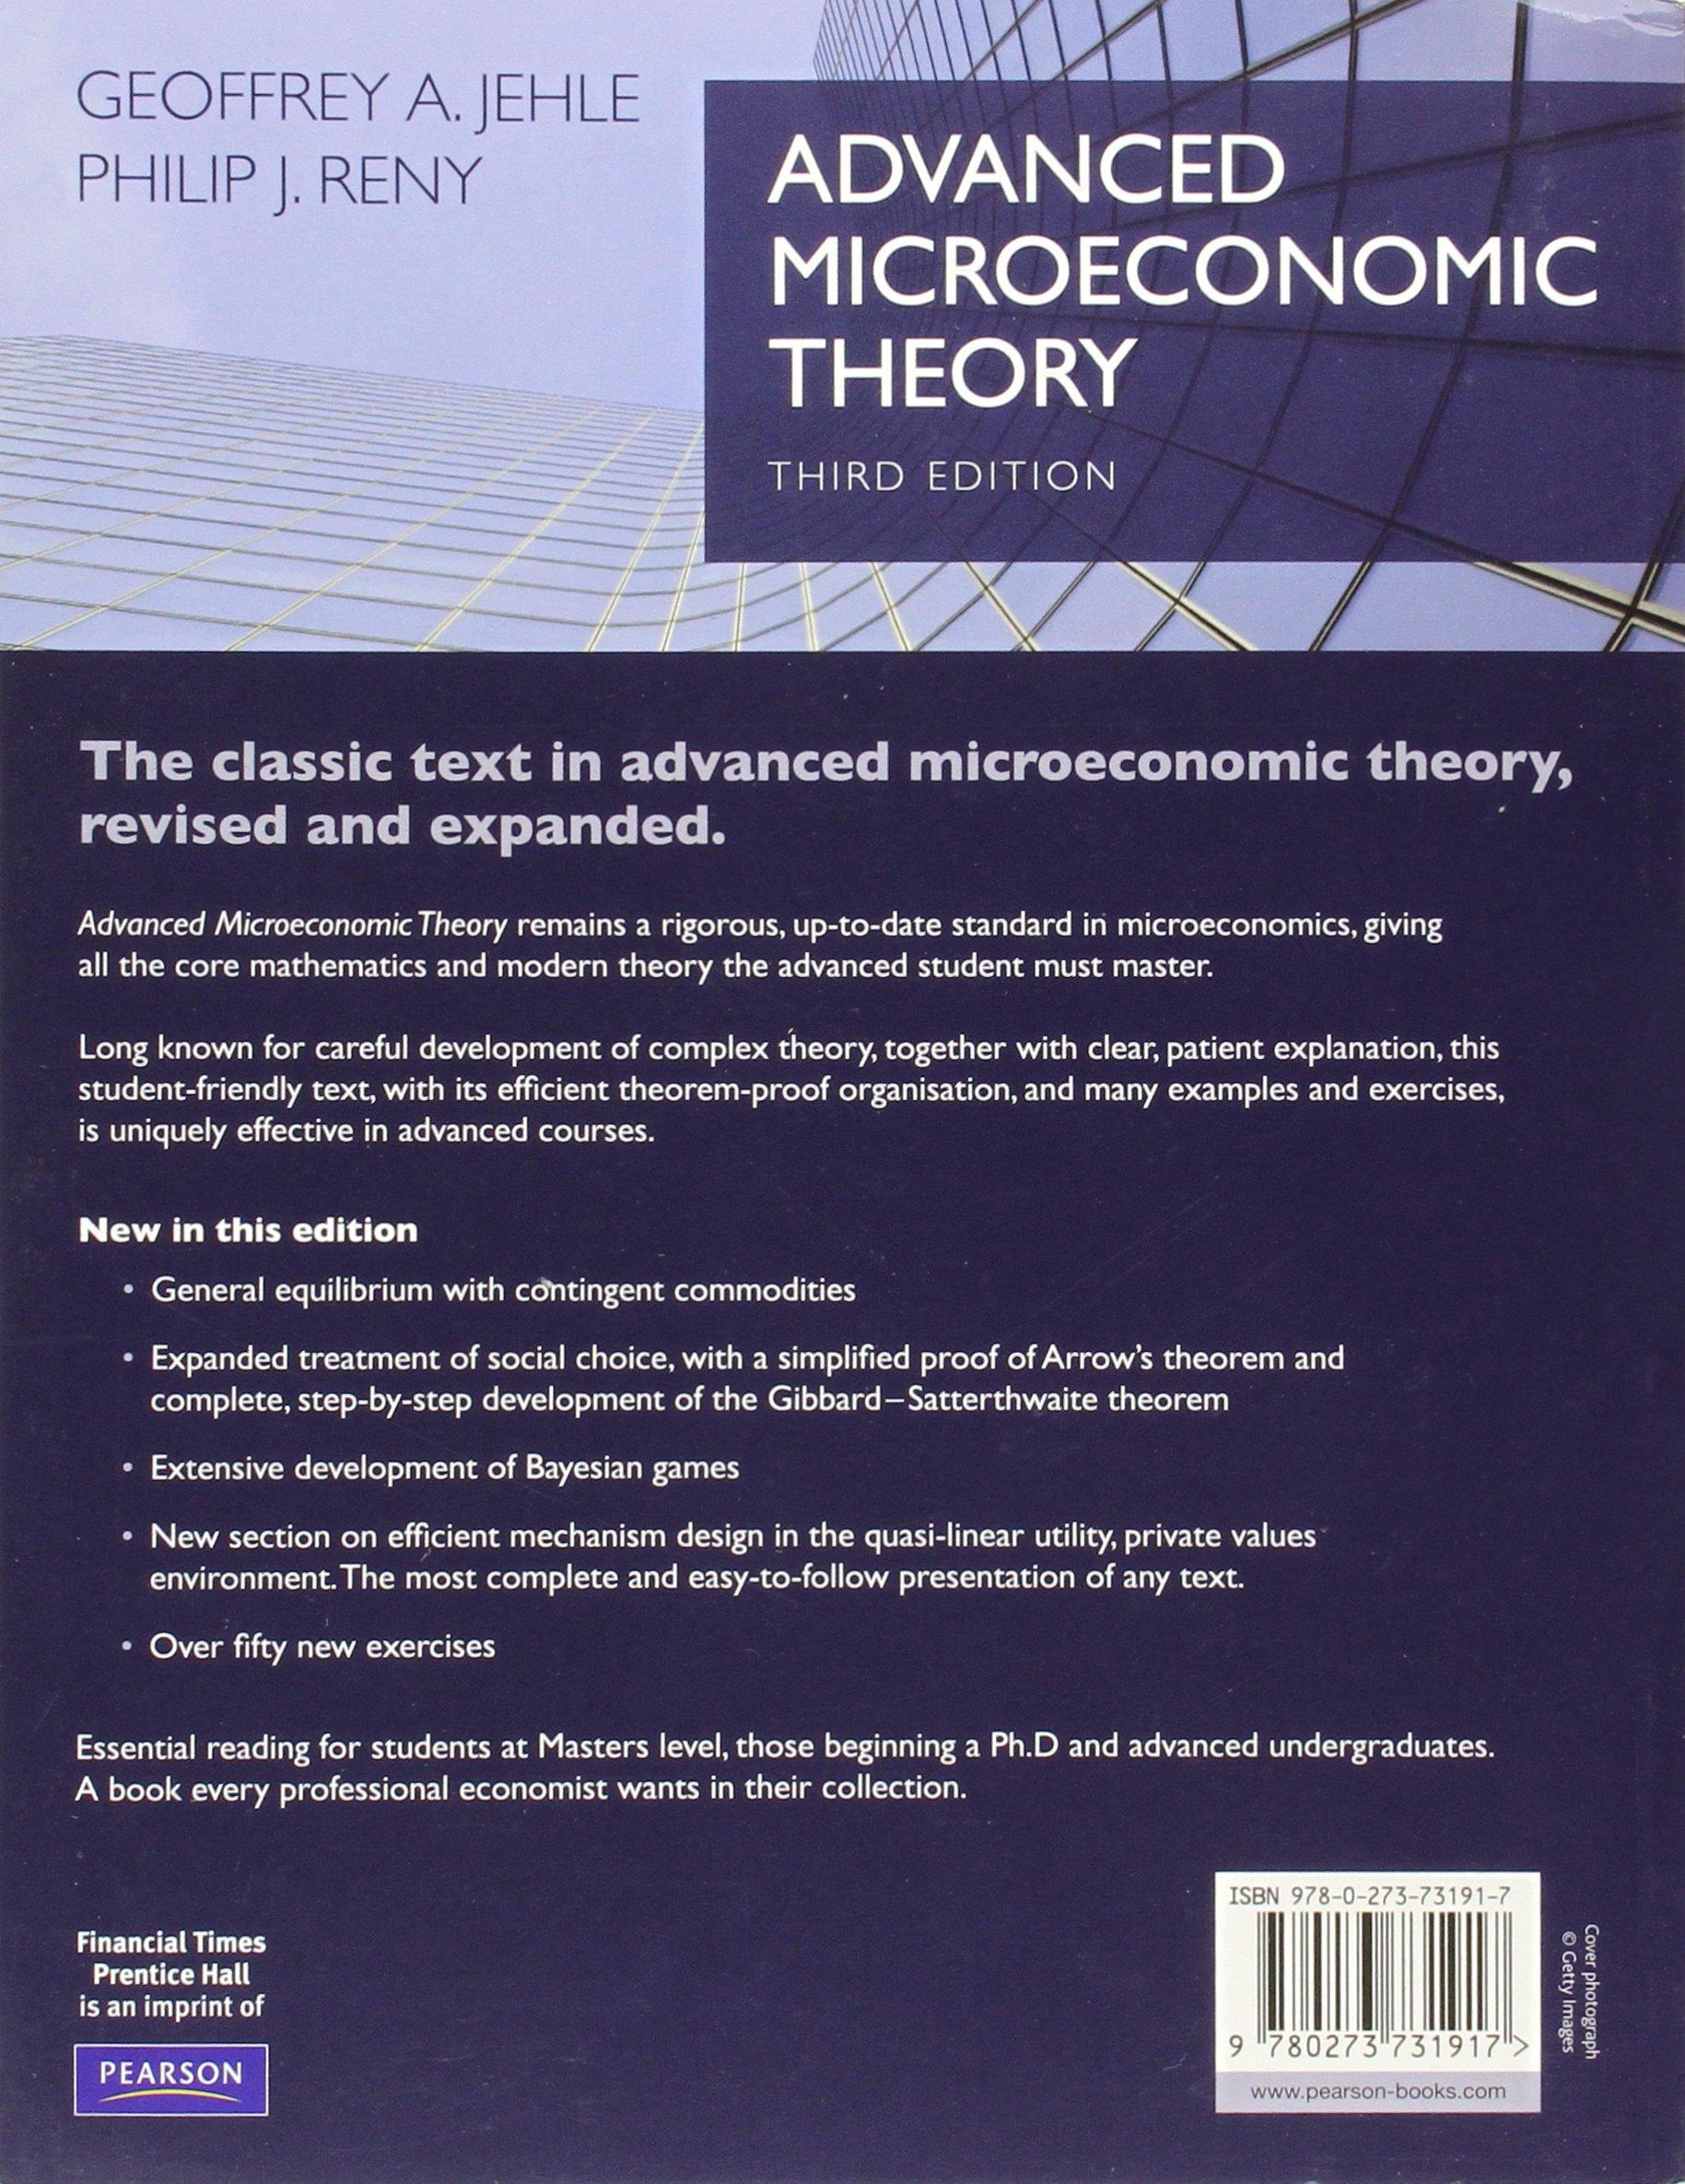 Advanced Microeconomic Theory (3rd Edition): Amazon.co.uk: Geoffrey Jehle:  9780273731917: Books